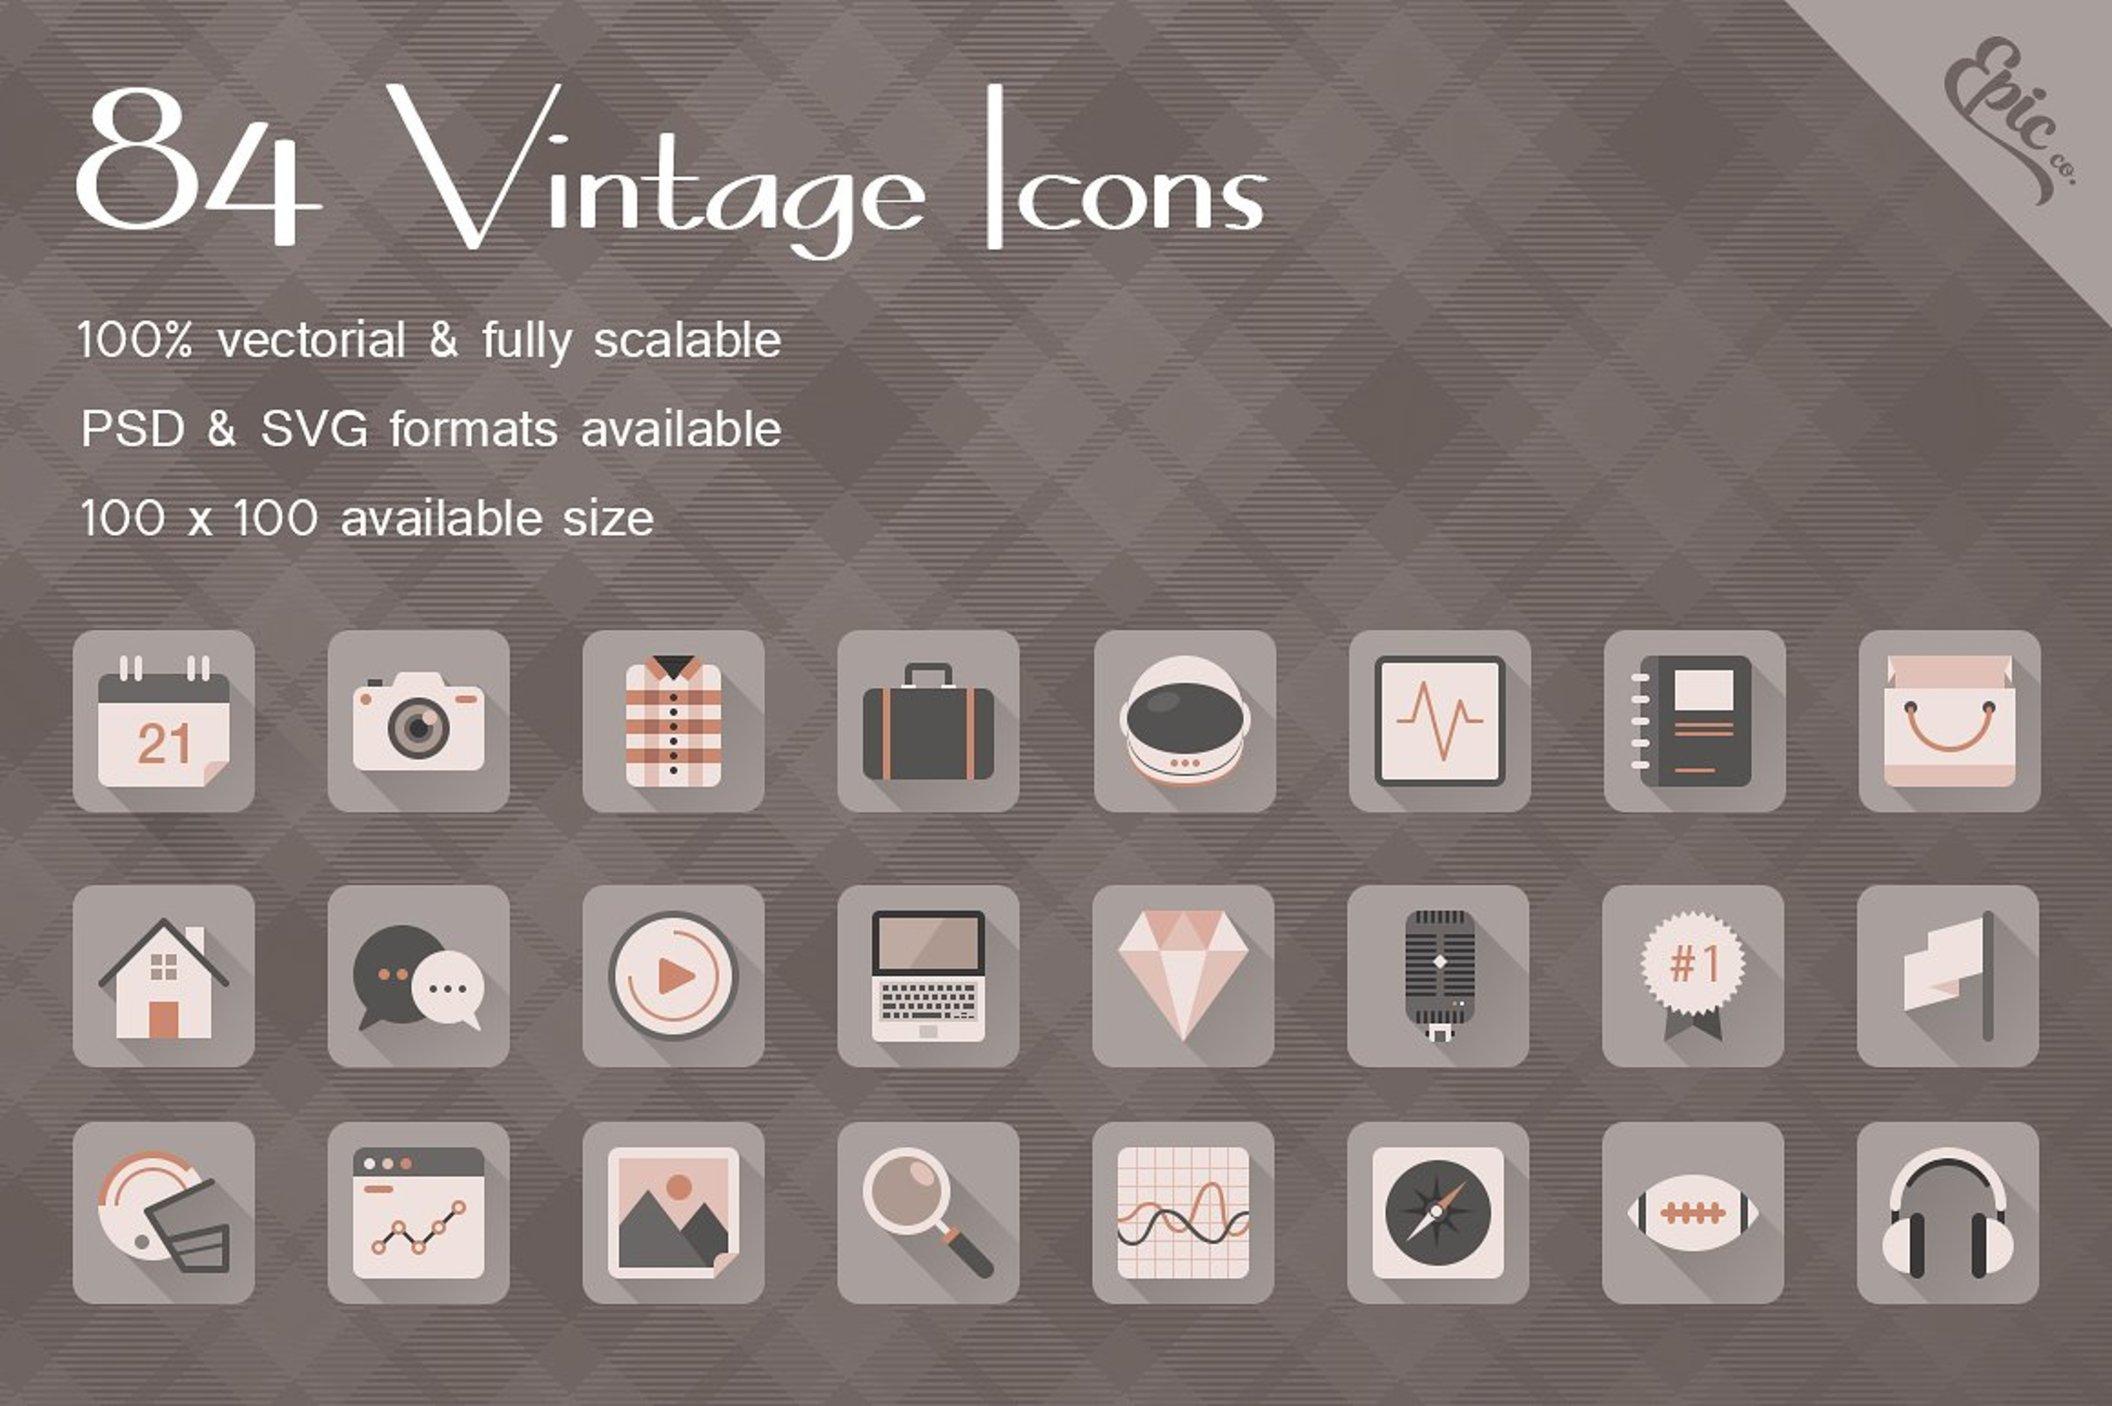 Epic Vintage Icons